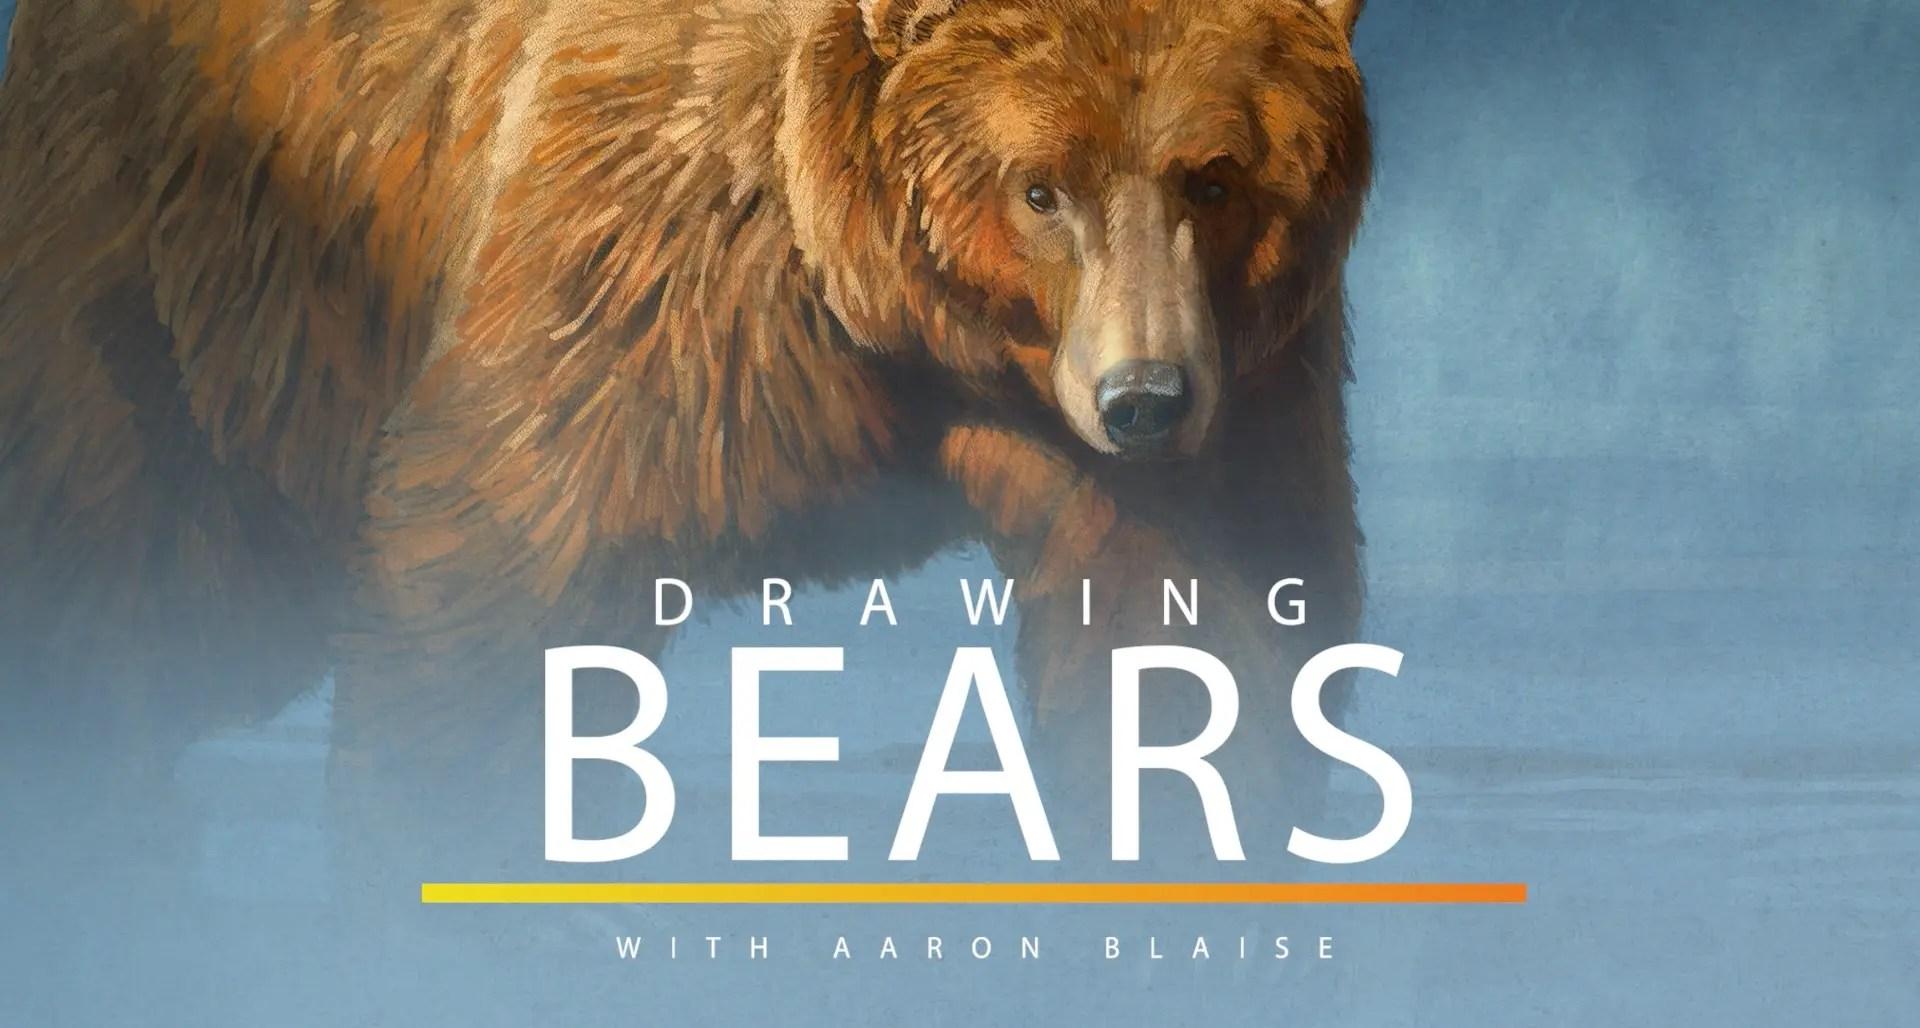 Tutoriales Diseño de Personajes | Como dibujar osos – Aaron Blaise